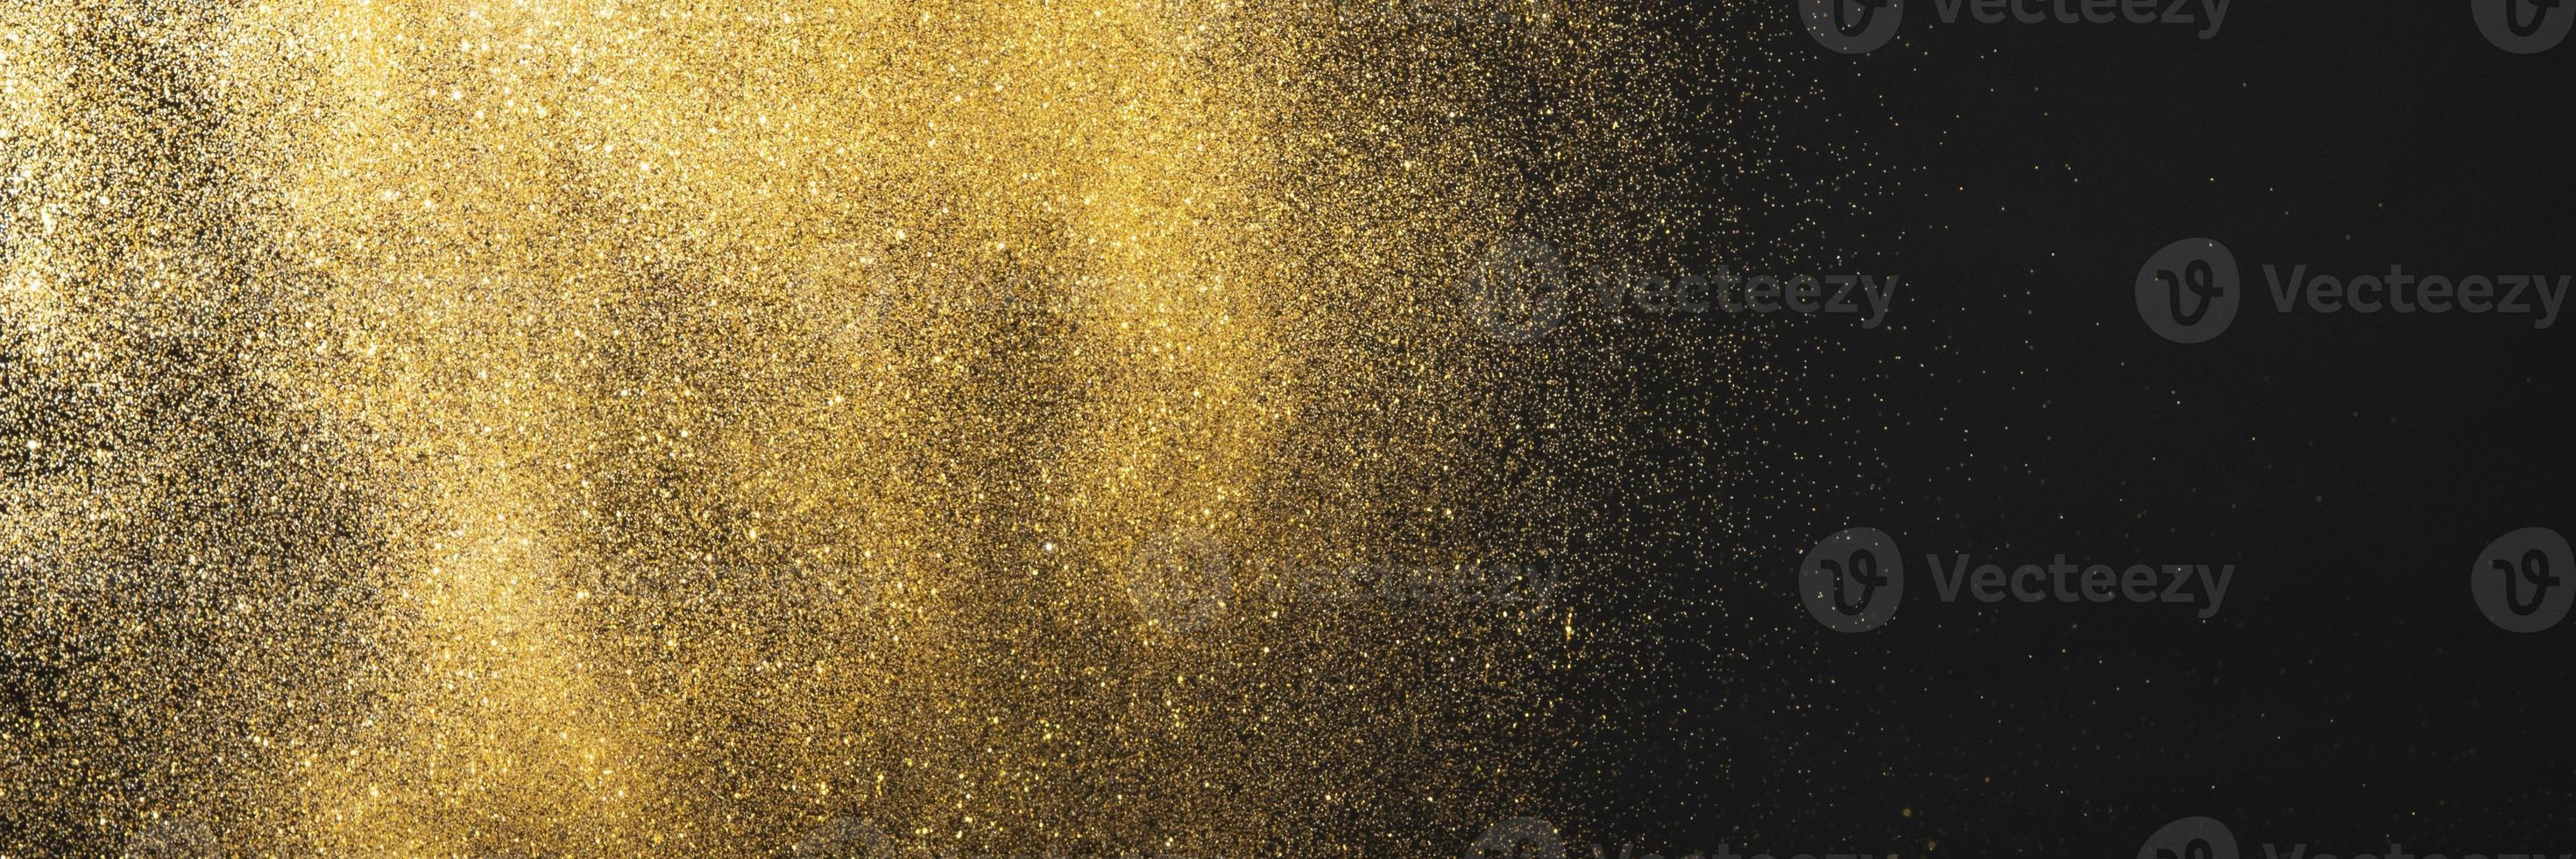 Golden glitter black background photo